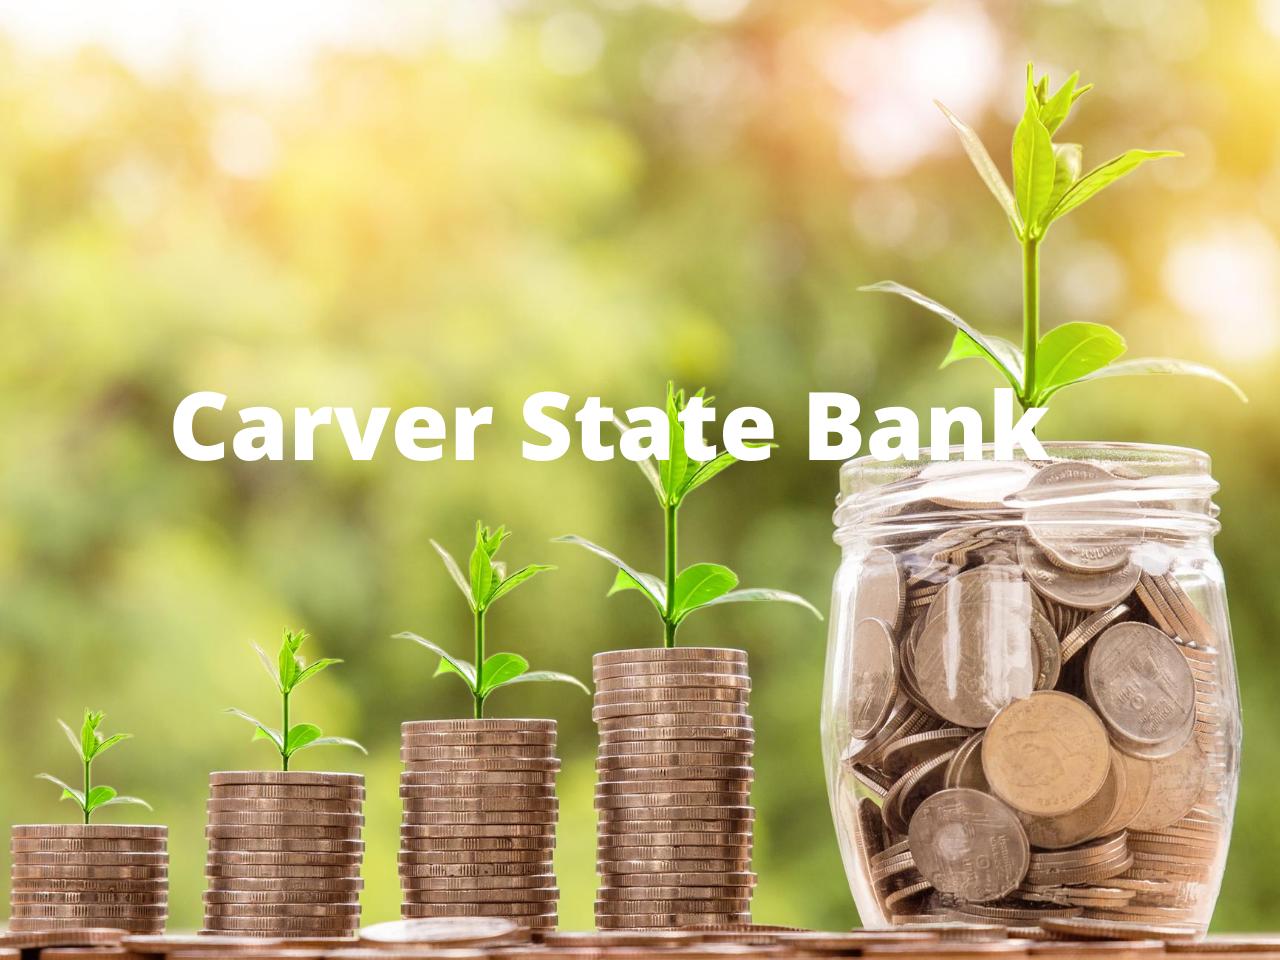 Carver State Bank of Savannah